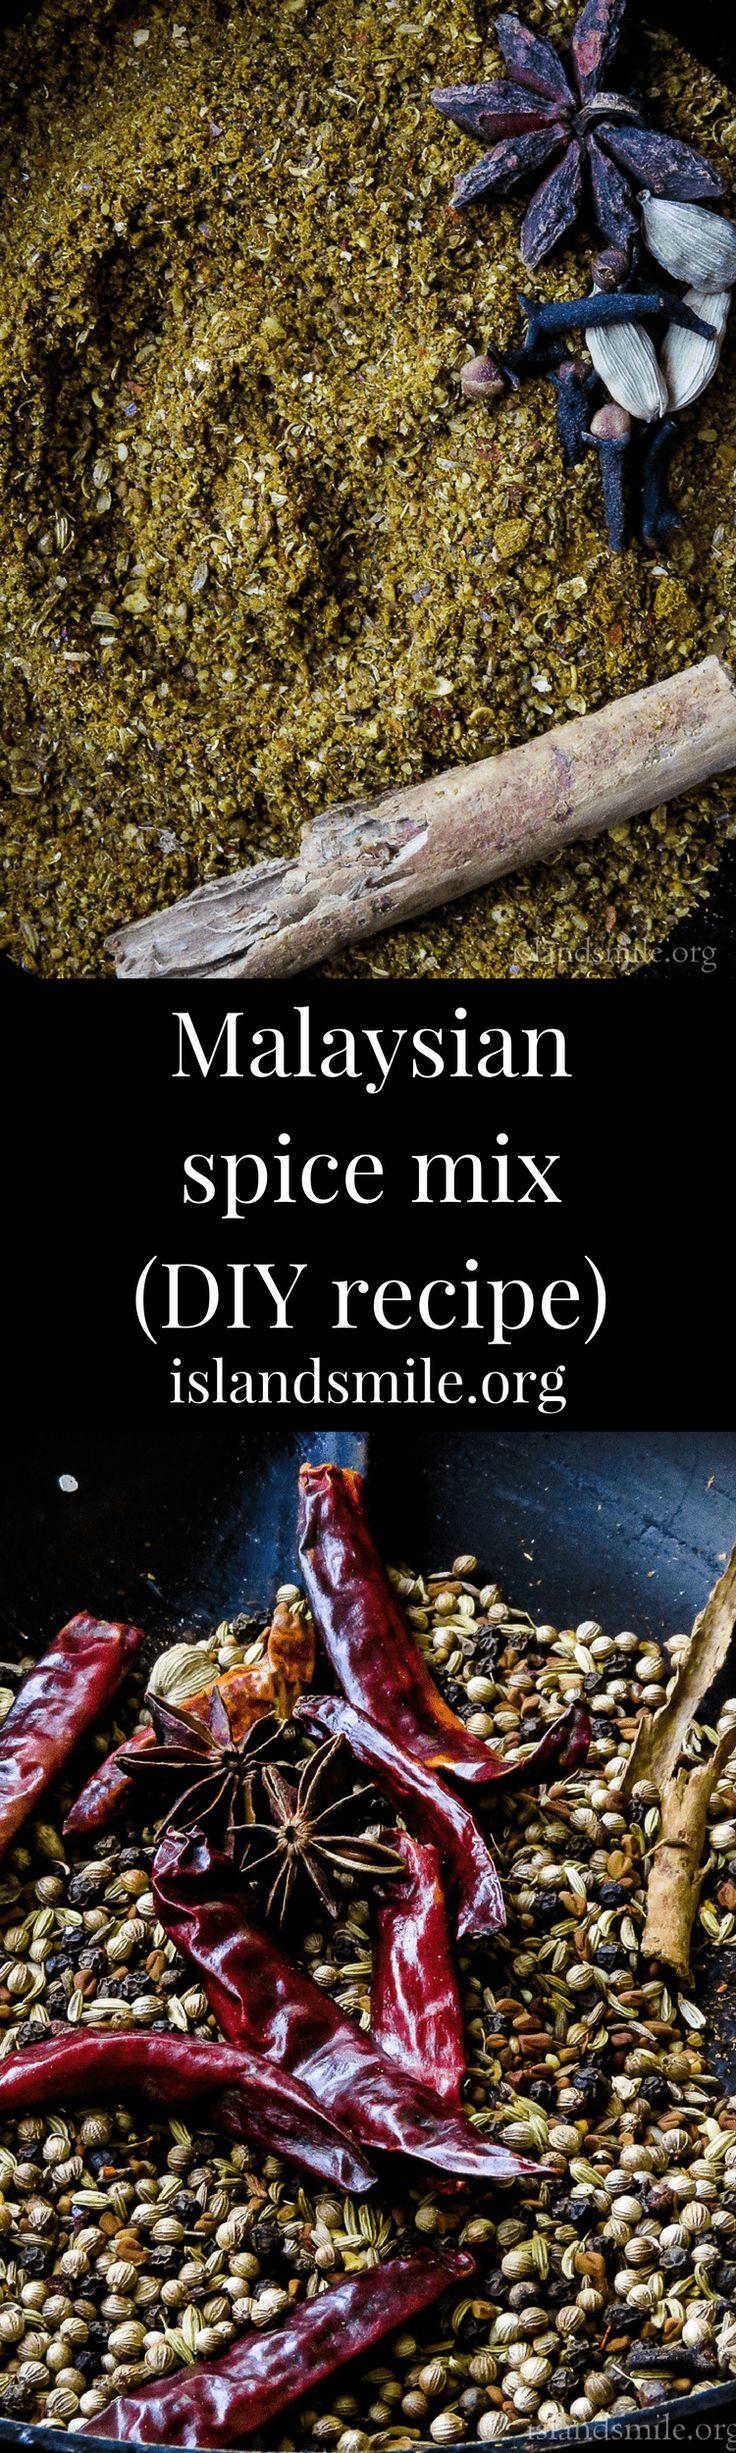 Malaysian spice mix(DIY recipe)-islandsmile.org